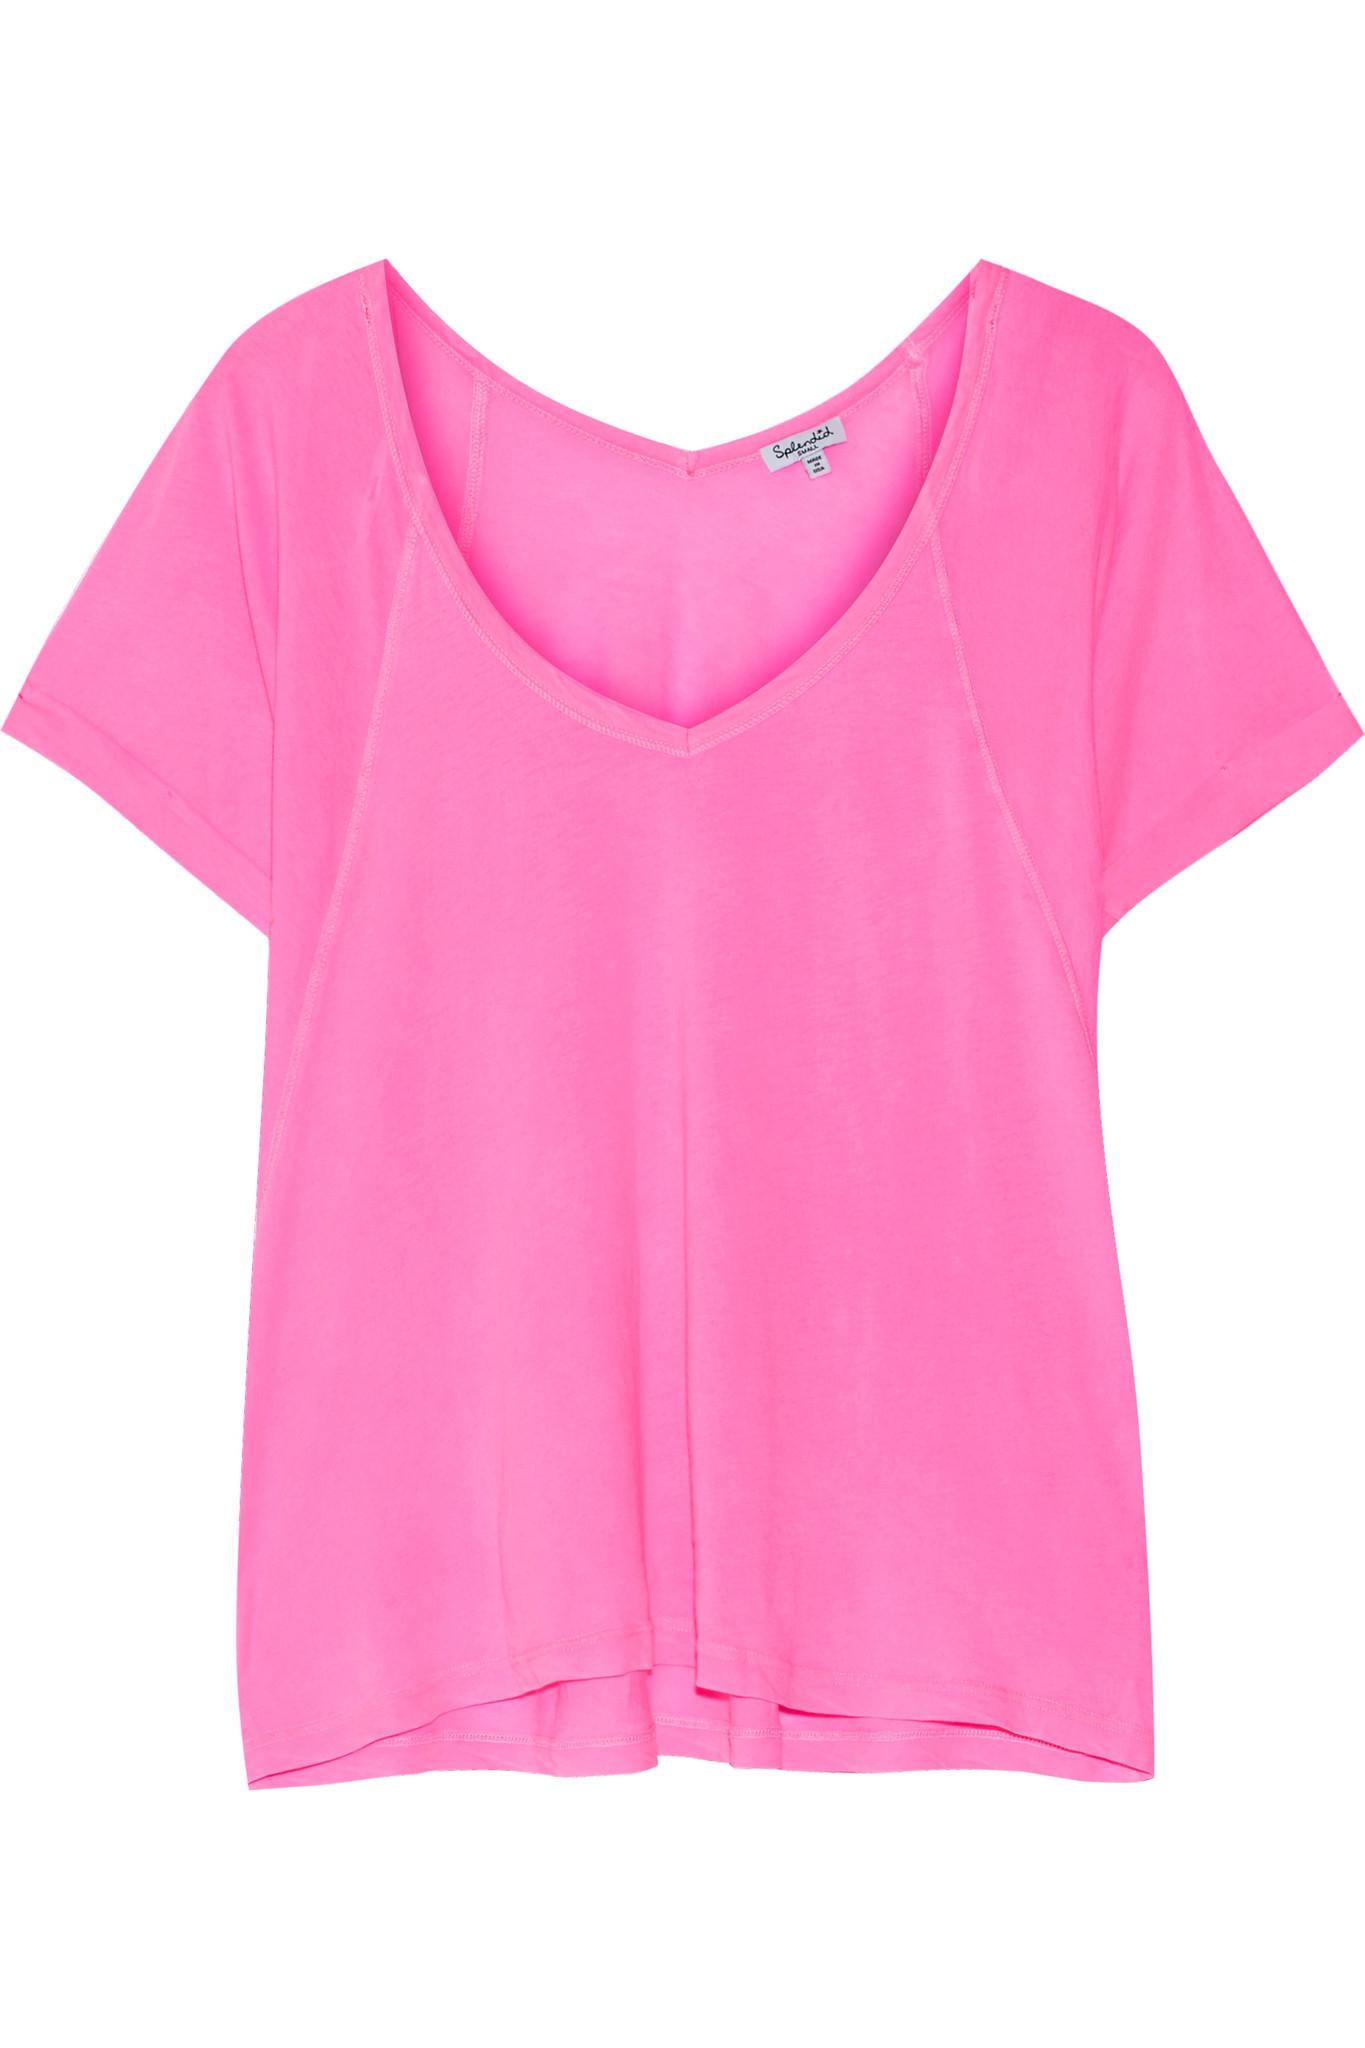 Lyst splendid vintage whisper supima cotton t shirt in pink for Supima cotton dress shirts